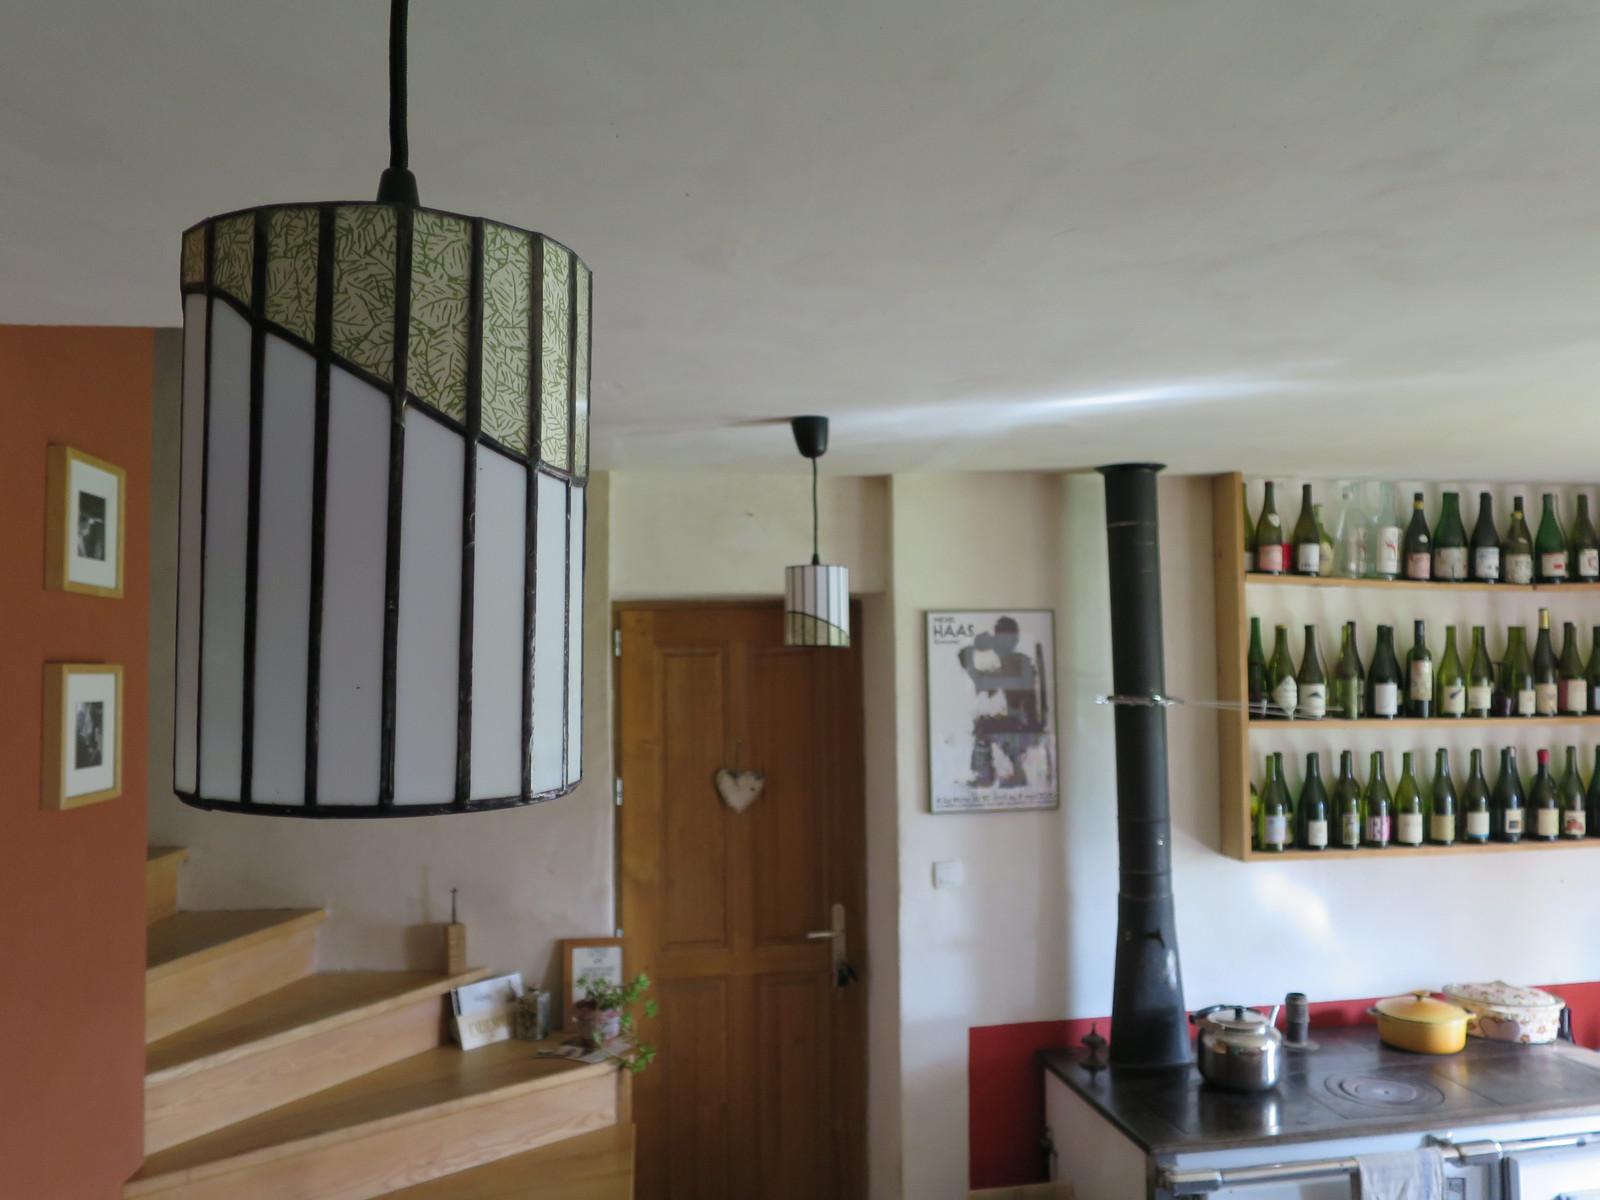 luminaire en verre. Black Bedroom Furniture Sets. Home Design Ideas